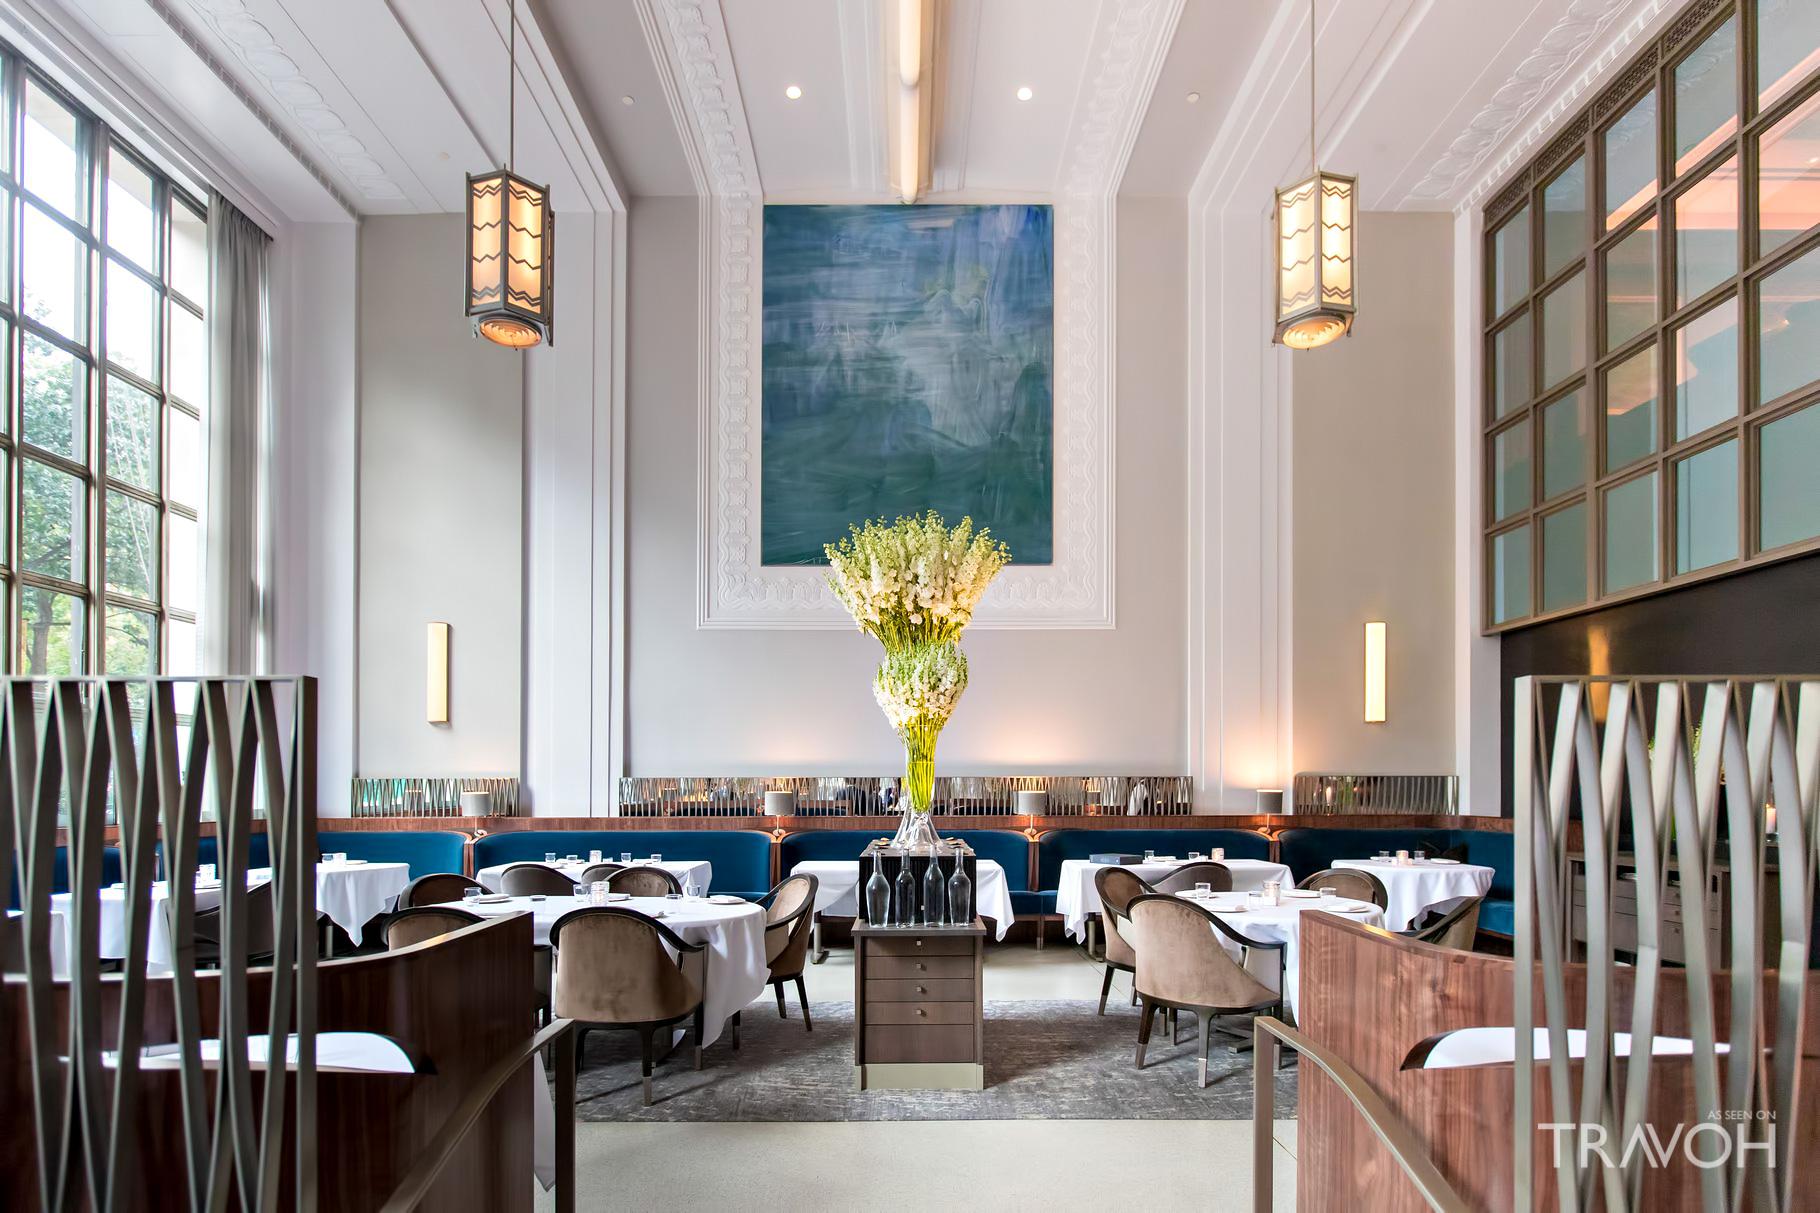 Eleven Madison Park Restaurant - 11 Madison Ave, New York, NY 10010, USA